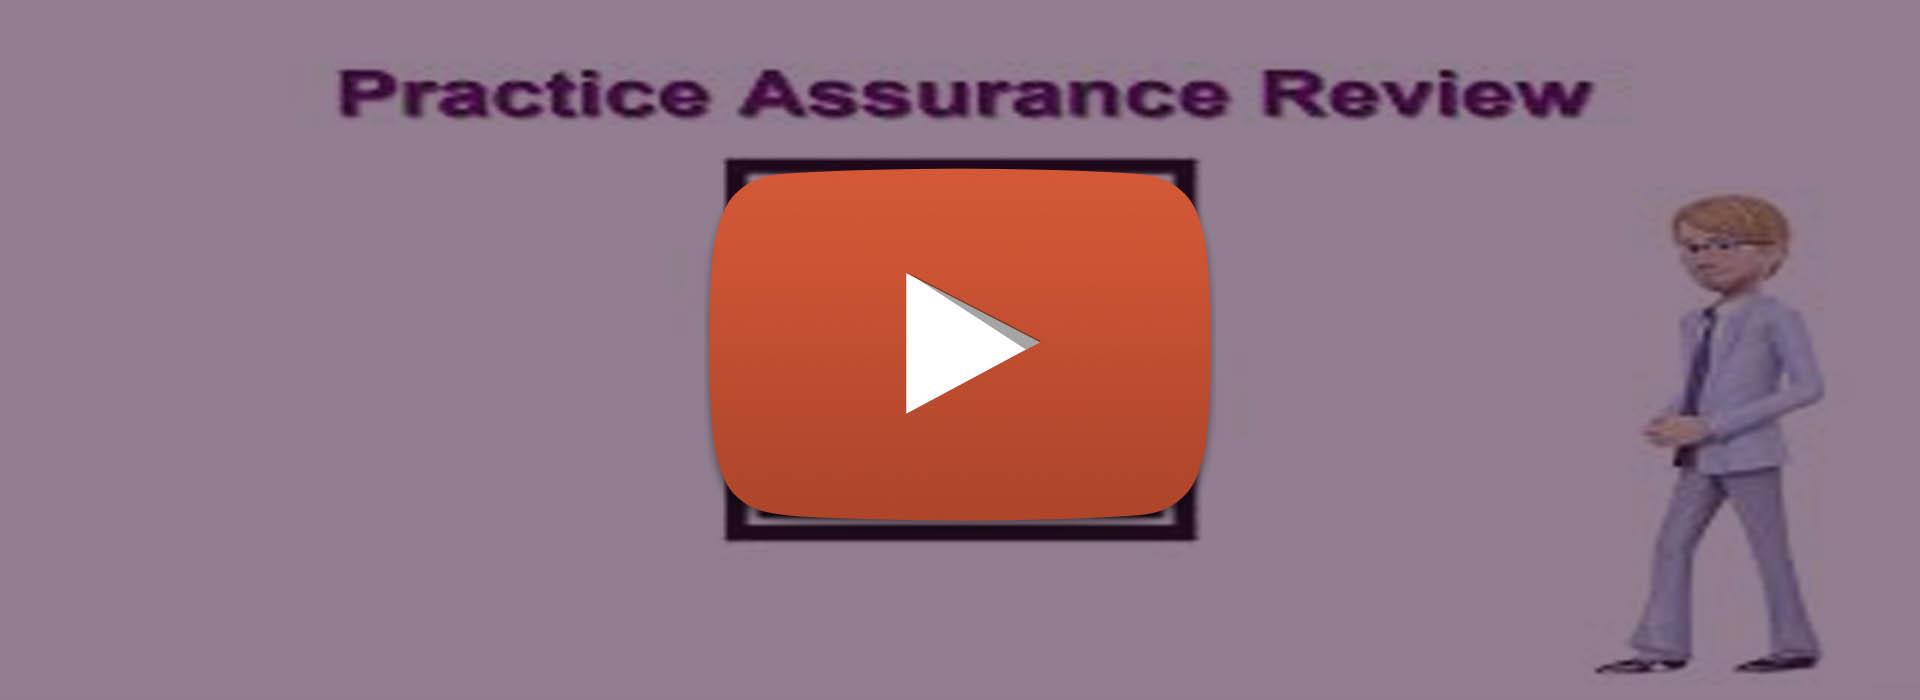 Assurance review